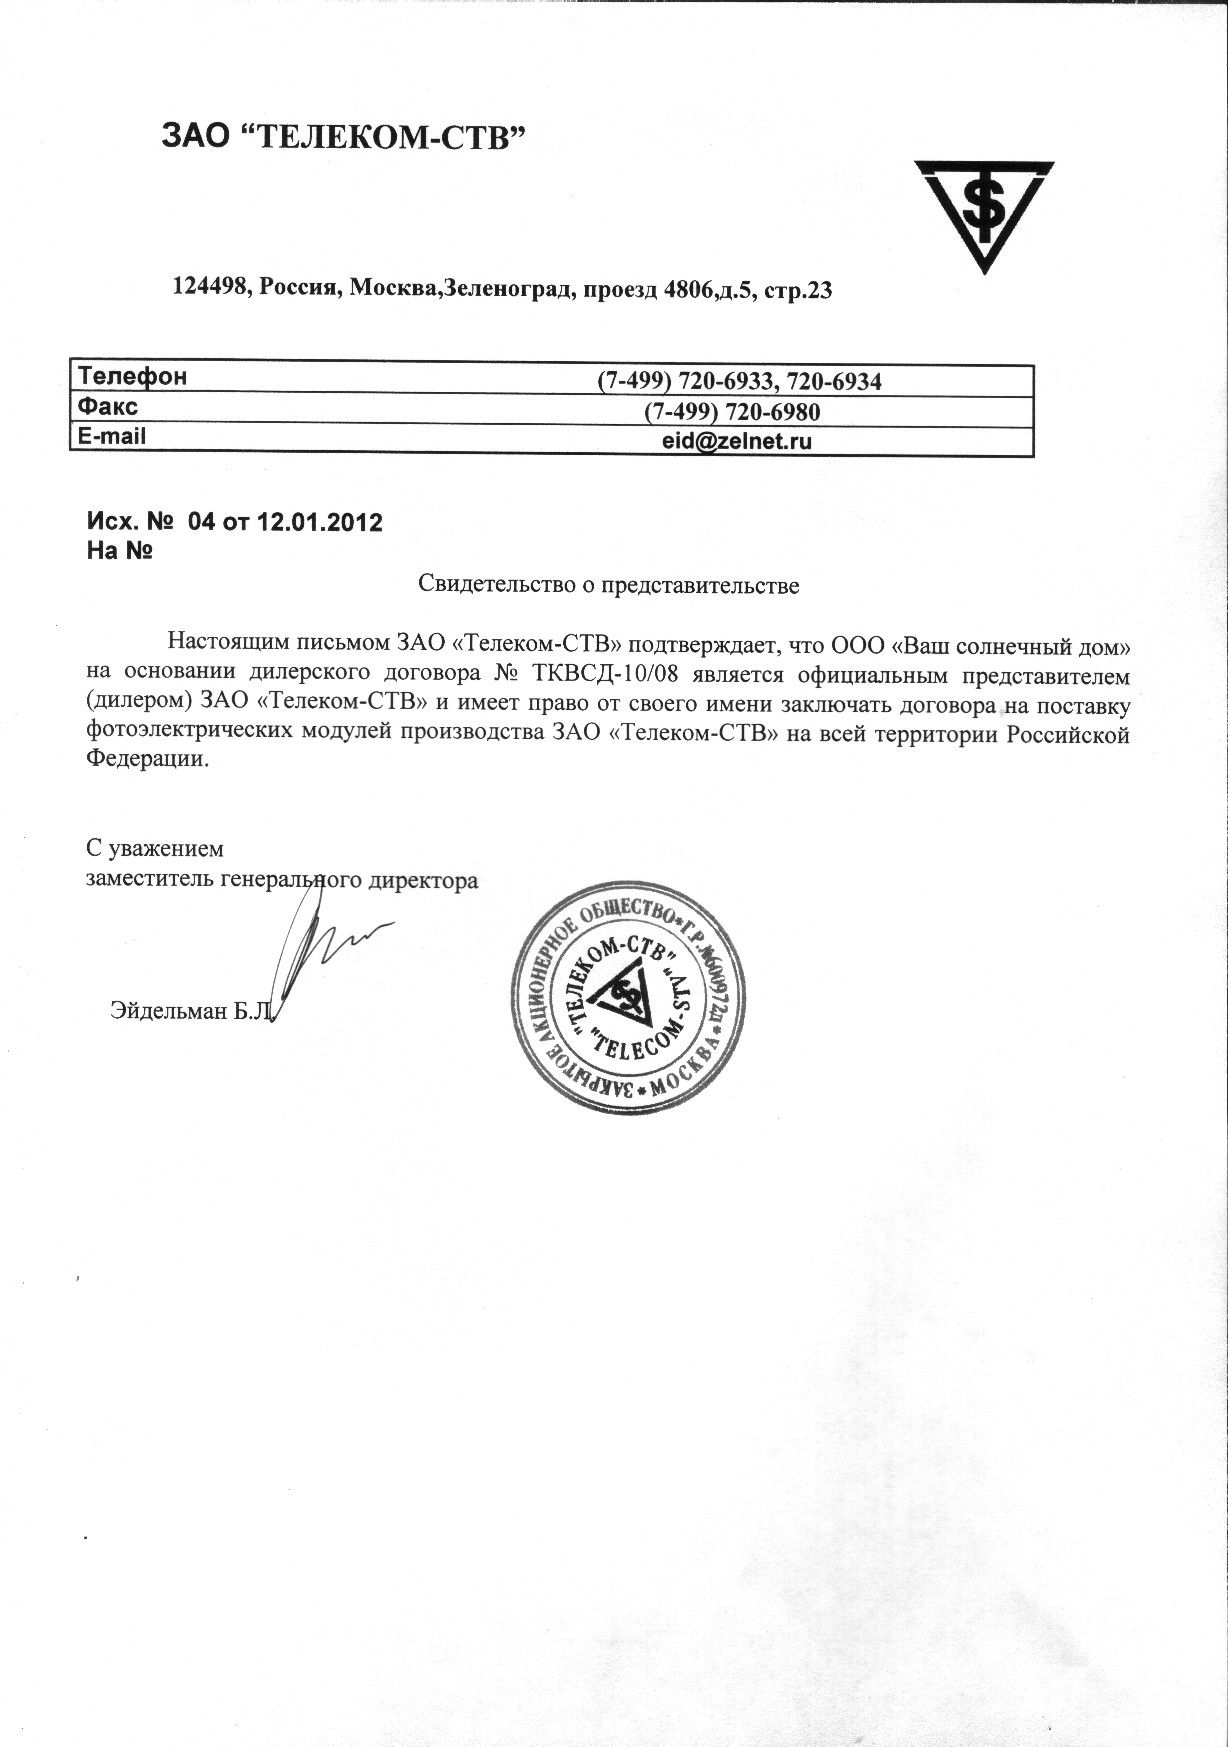 Сертификат дилера Телеком-СТВ